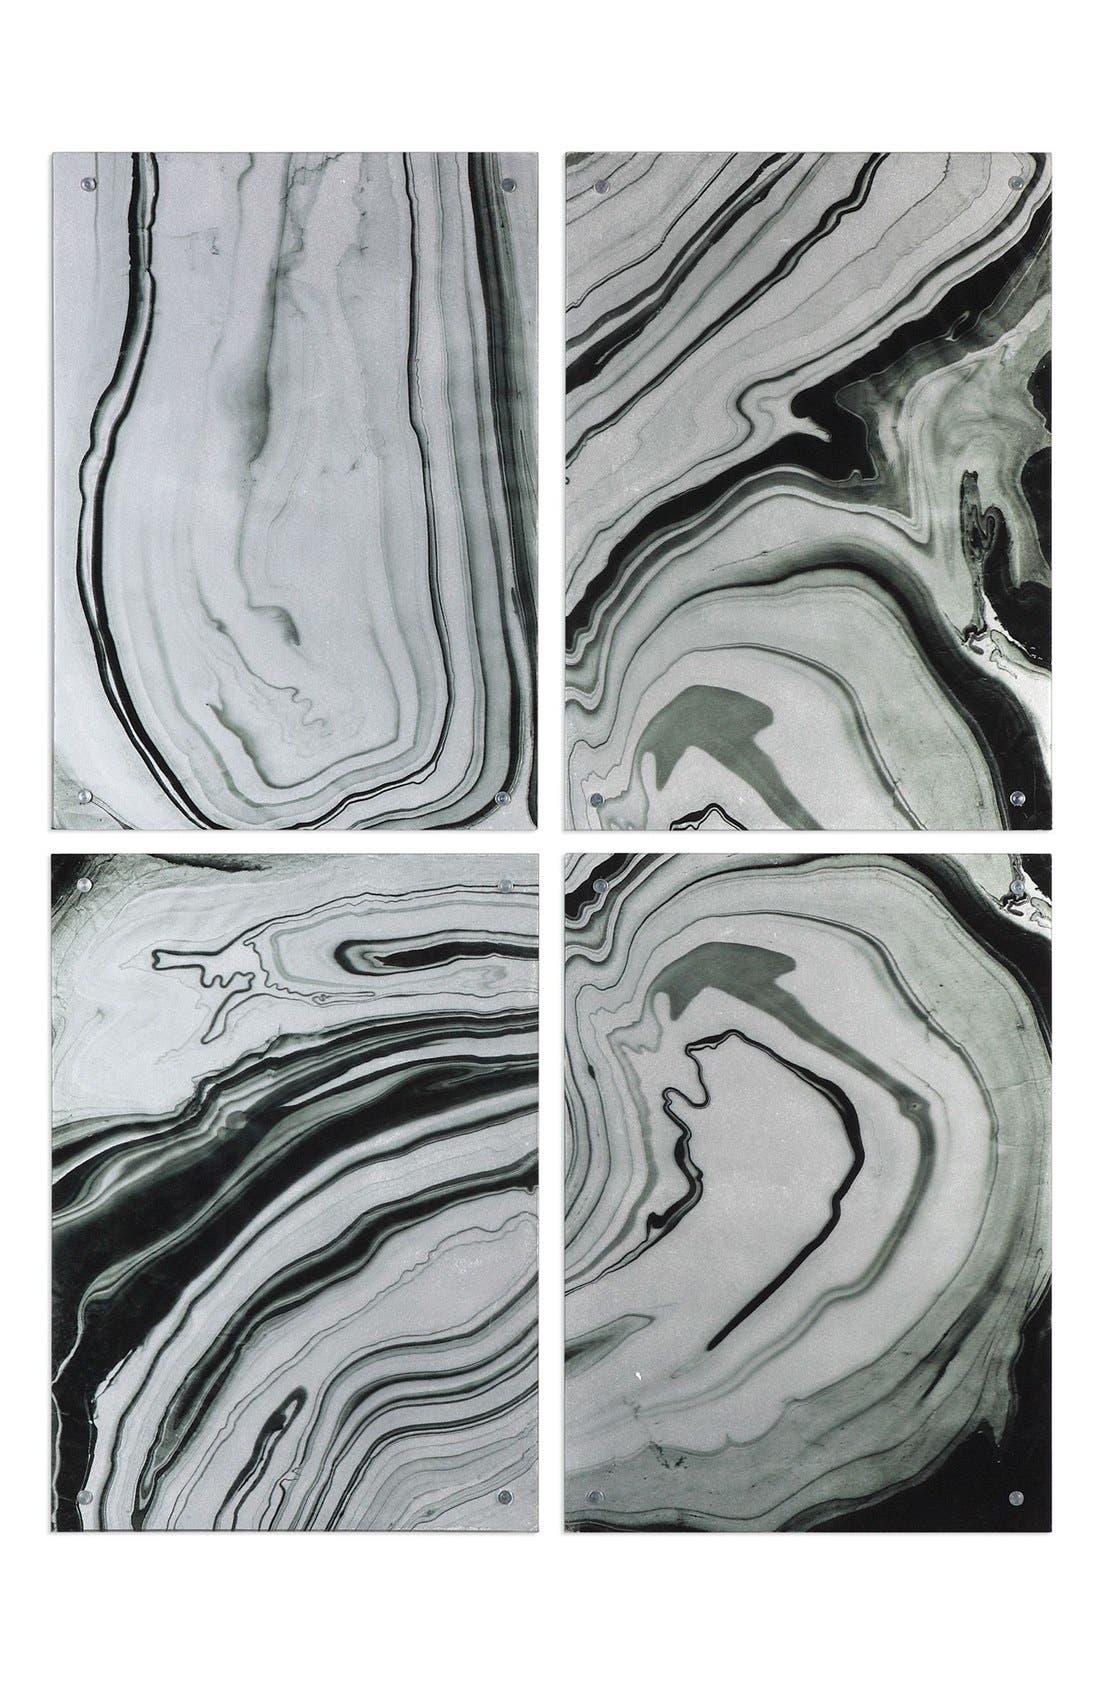 Alternate Image 1 Selected - Uttermost 'Echos' Wall Art (Set of 4)